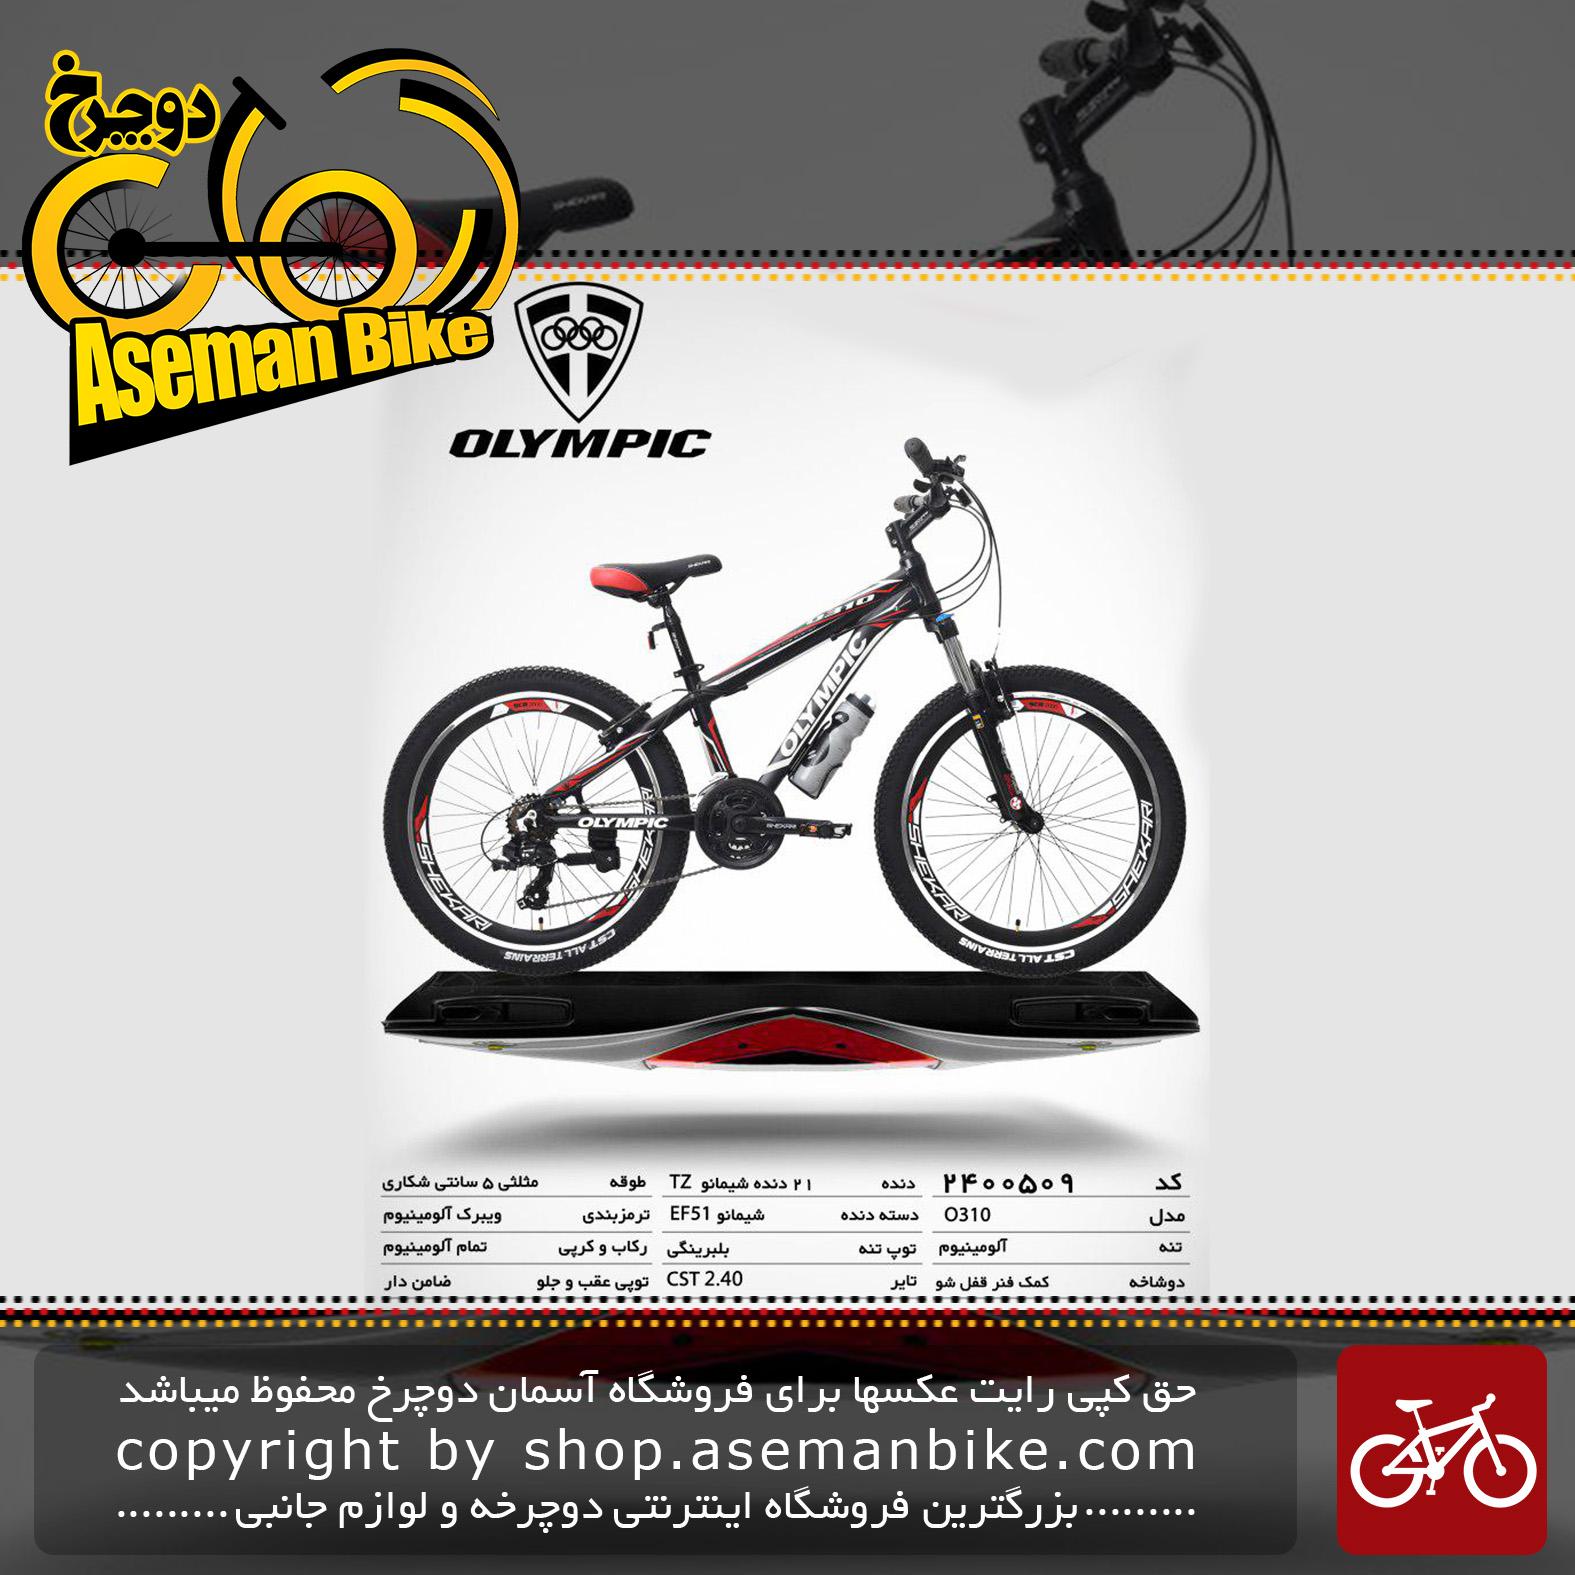 دوچرخه کوهستان شهری المپیک 21 دنده مدل او 310 سایز 24 ساخت تایوان OLYMPIC Mountain City Bicycle Taiwan O310 Size 24 2019